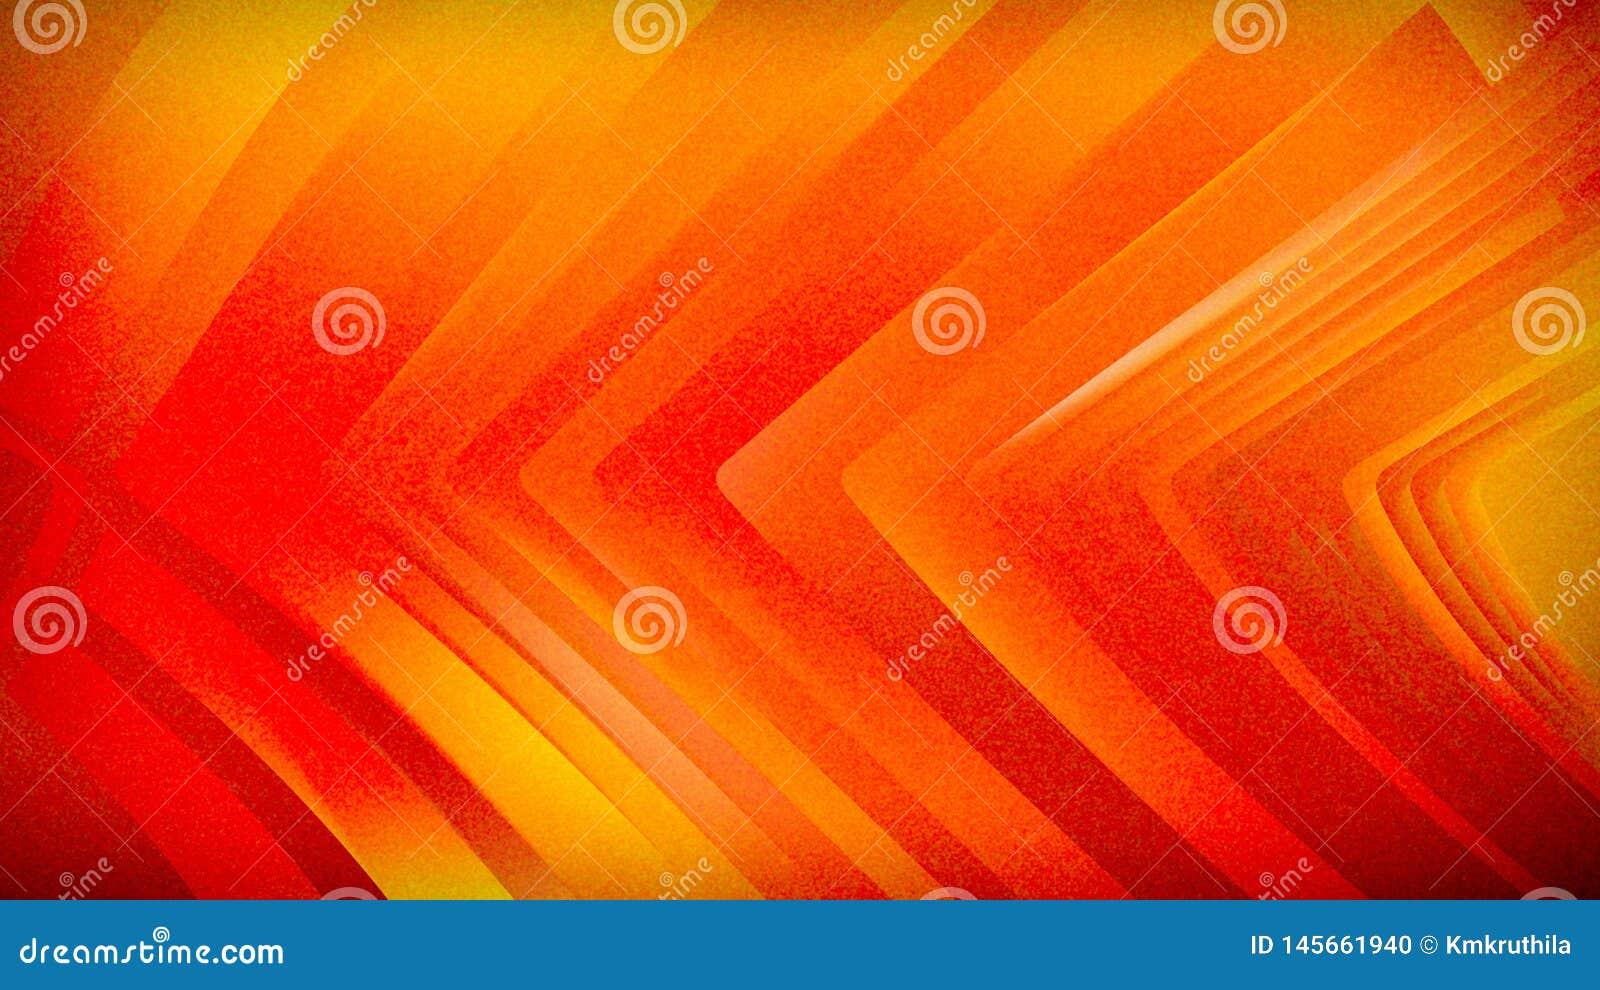 Orange Yellow Red Beautiful elegant Illustration graphic art design Background